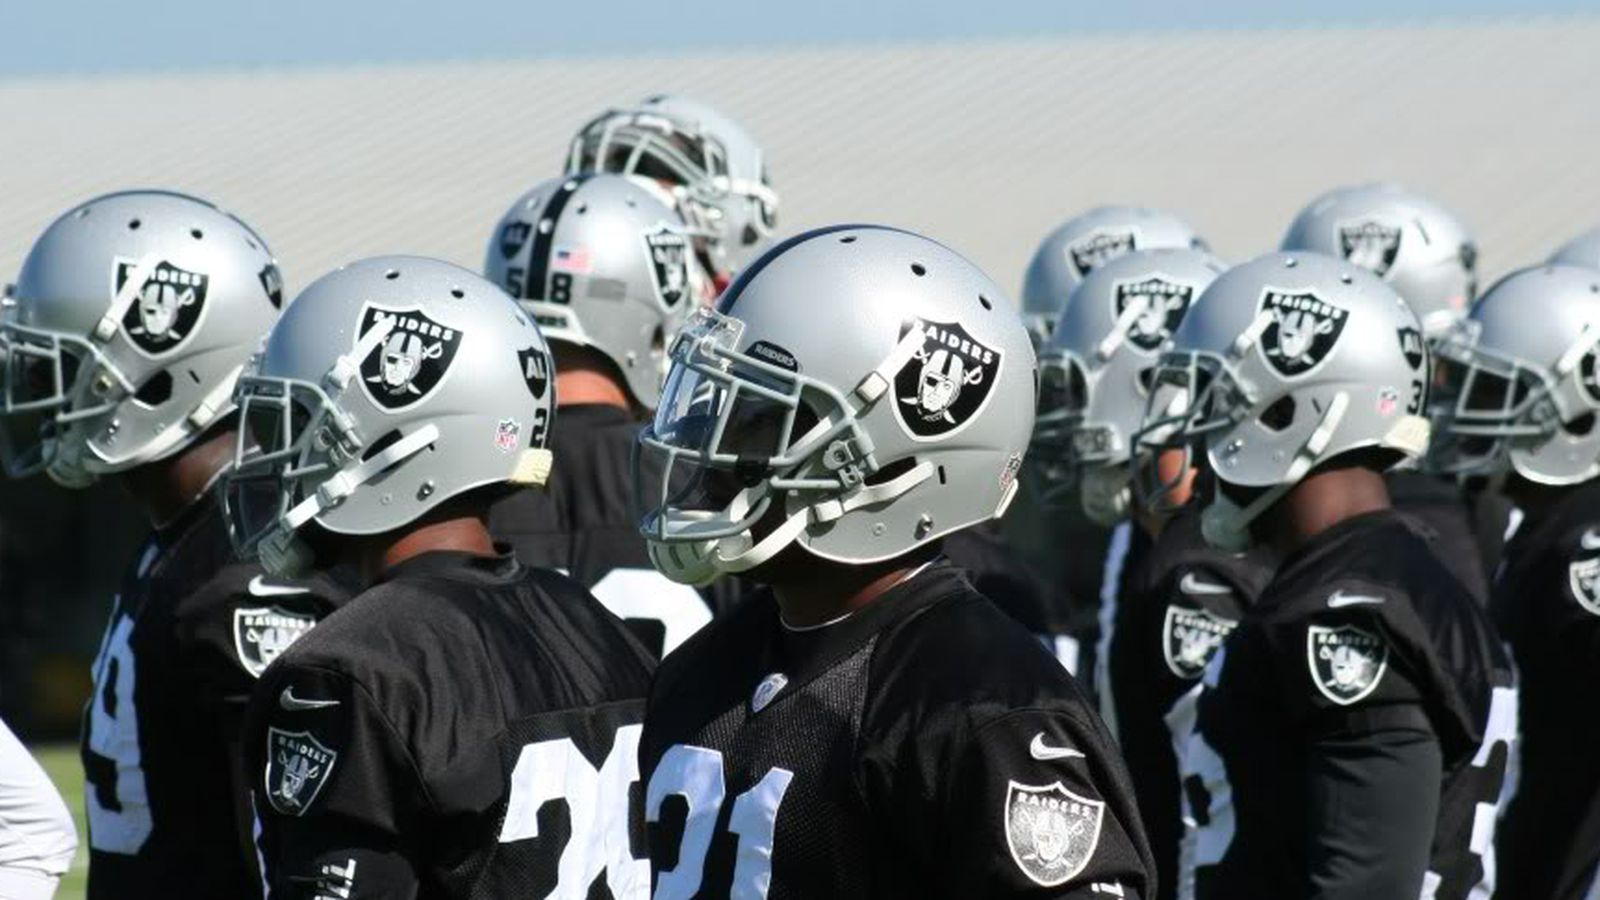 Raiders depth chart post draft - Silver And Black Pride